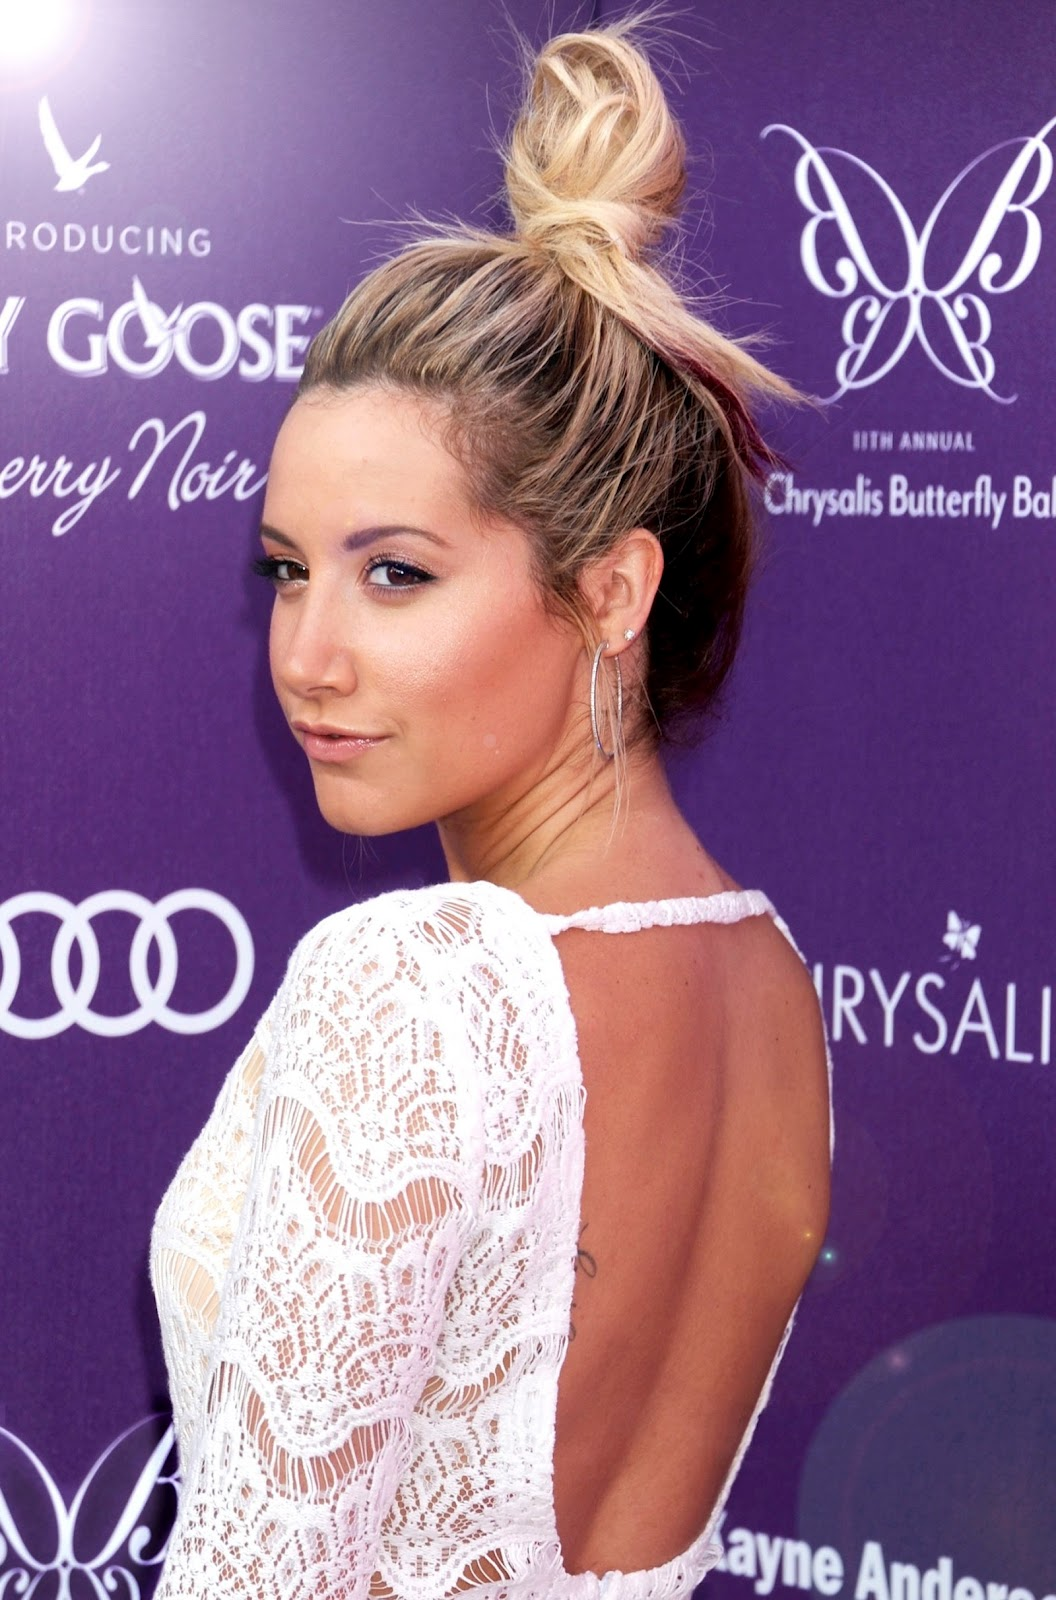 http://2.bp.blogspot.com/-4spxrGWd6eo/T9UBrtE6LdI/AAAAAAAAGUA/Sp9zaadQHtA/s1600/Ashley-Tisdale-121.jpg